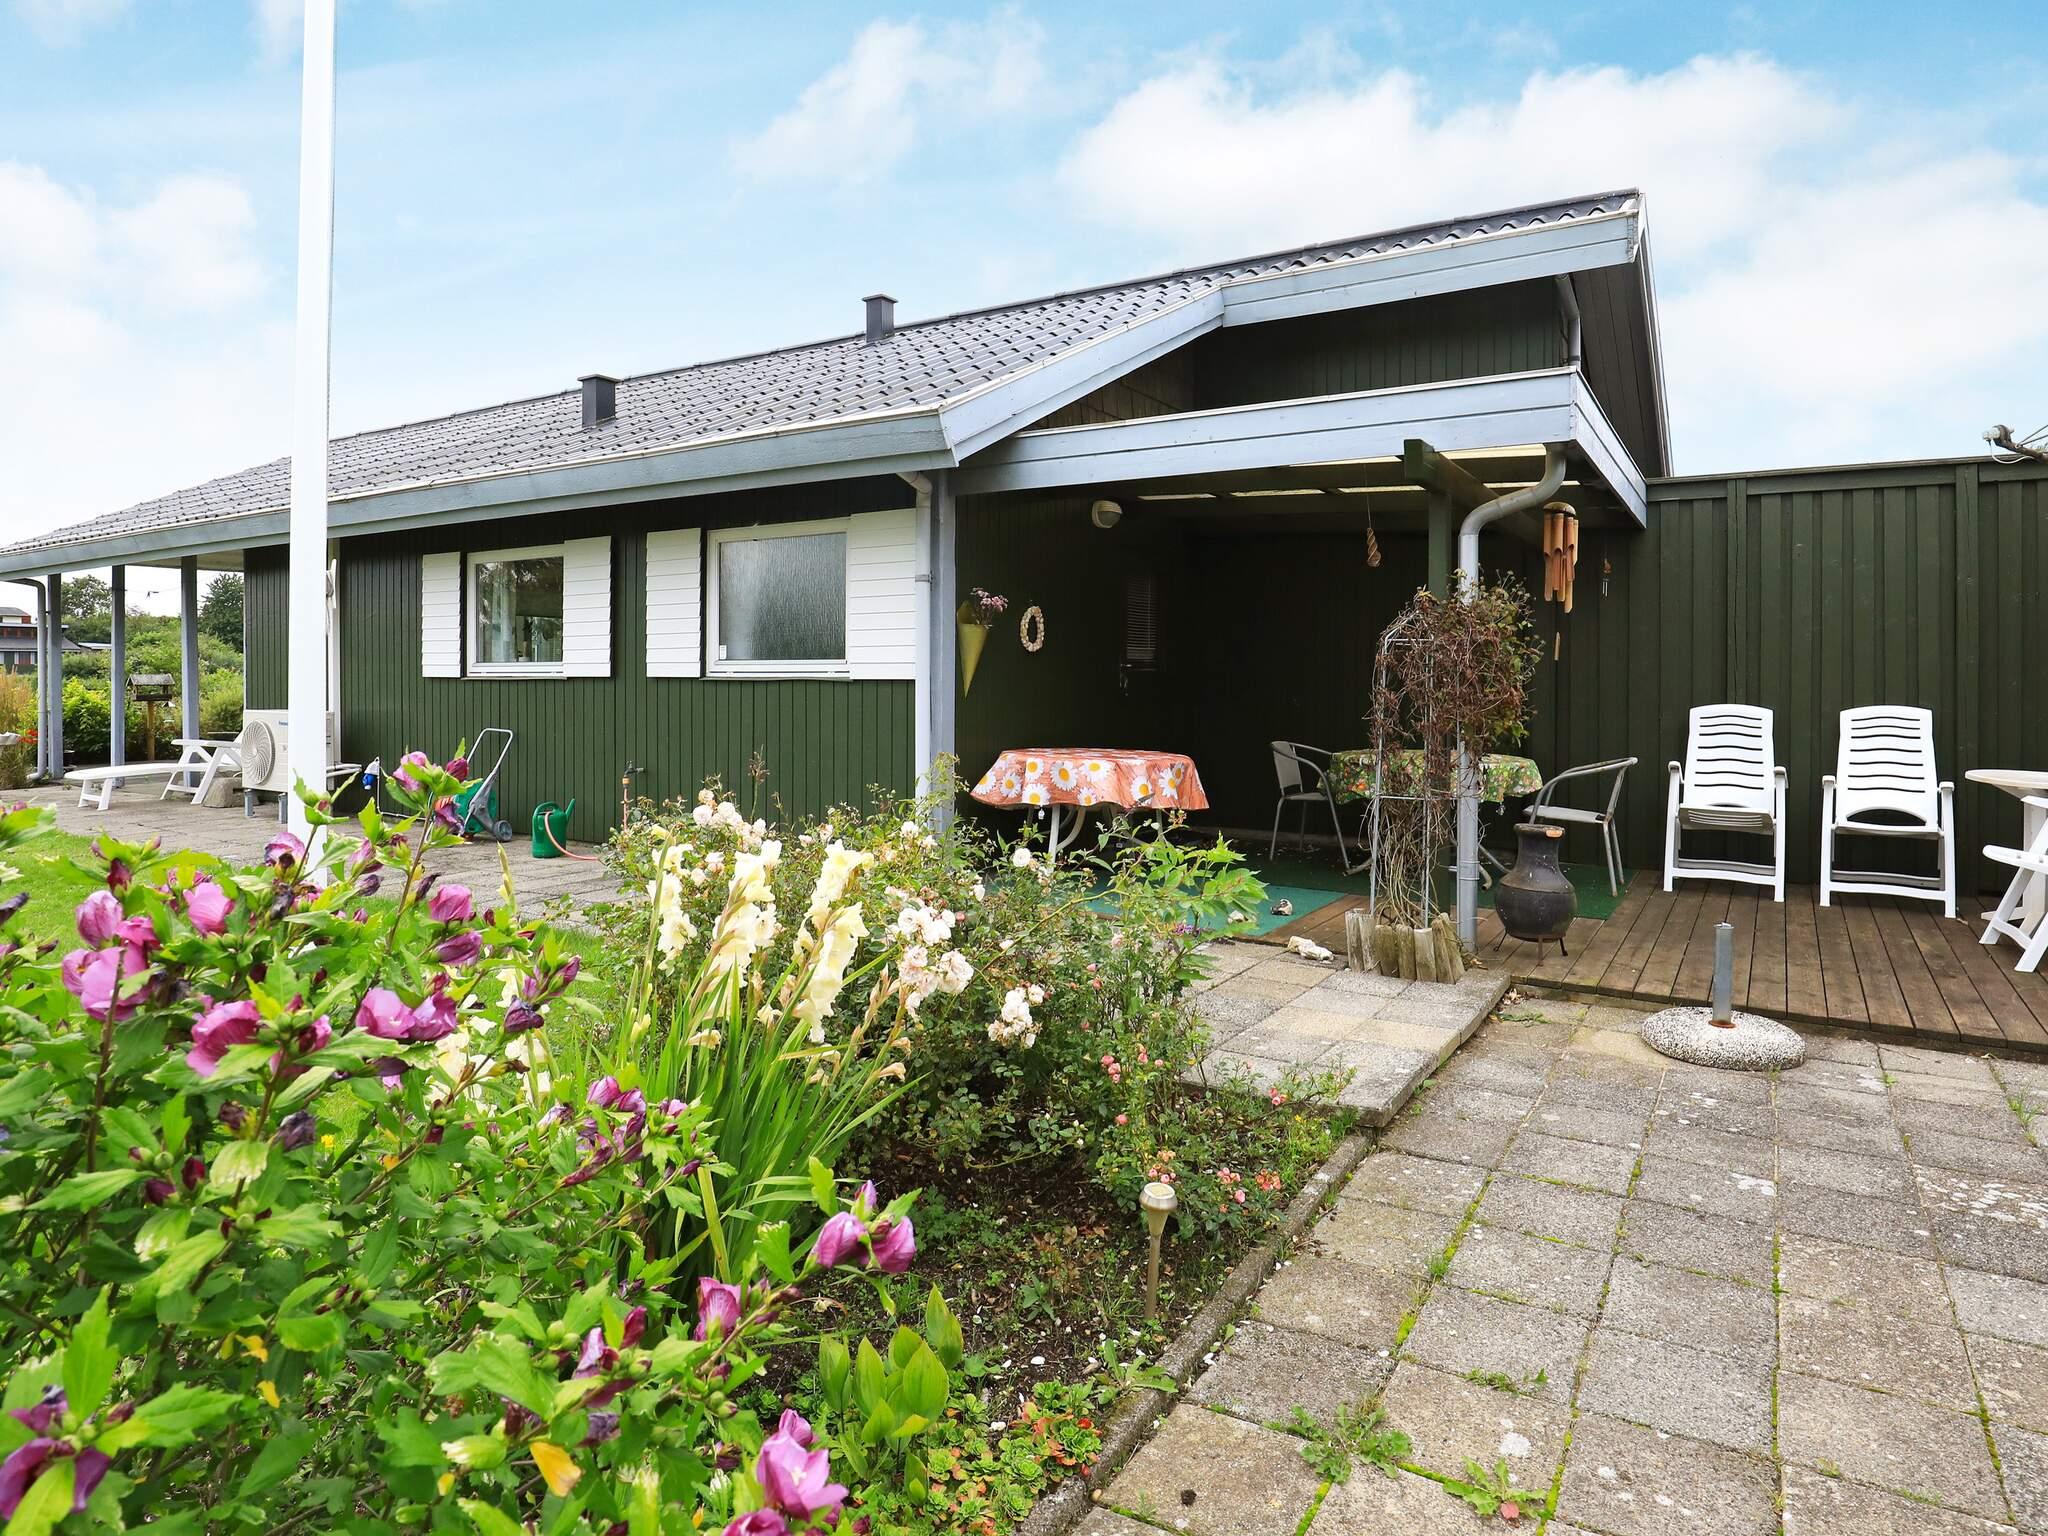 Maison de vacances Eskov Strandpark (610274), Roslev, , Limfjord, Danemark, image 17